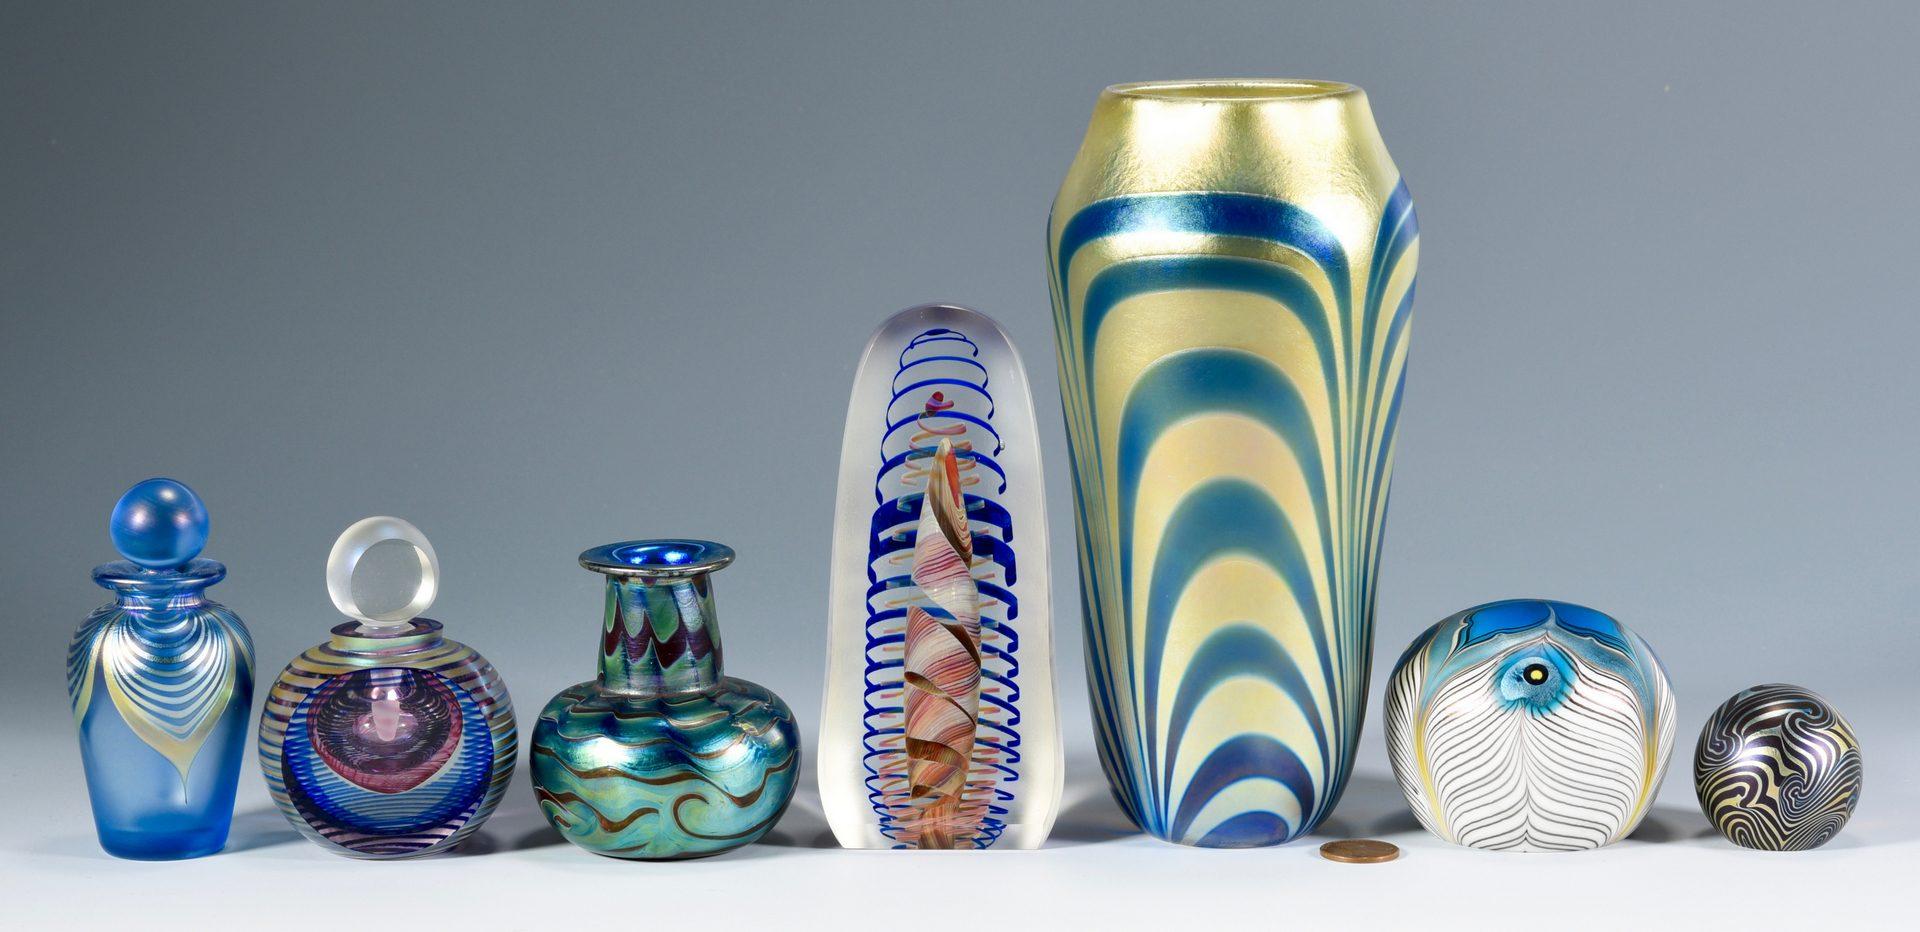 Lot 496: 7 pcs. Contemporary Art Glass, Incl. Lotton &  Lundberg